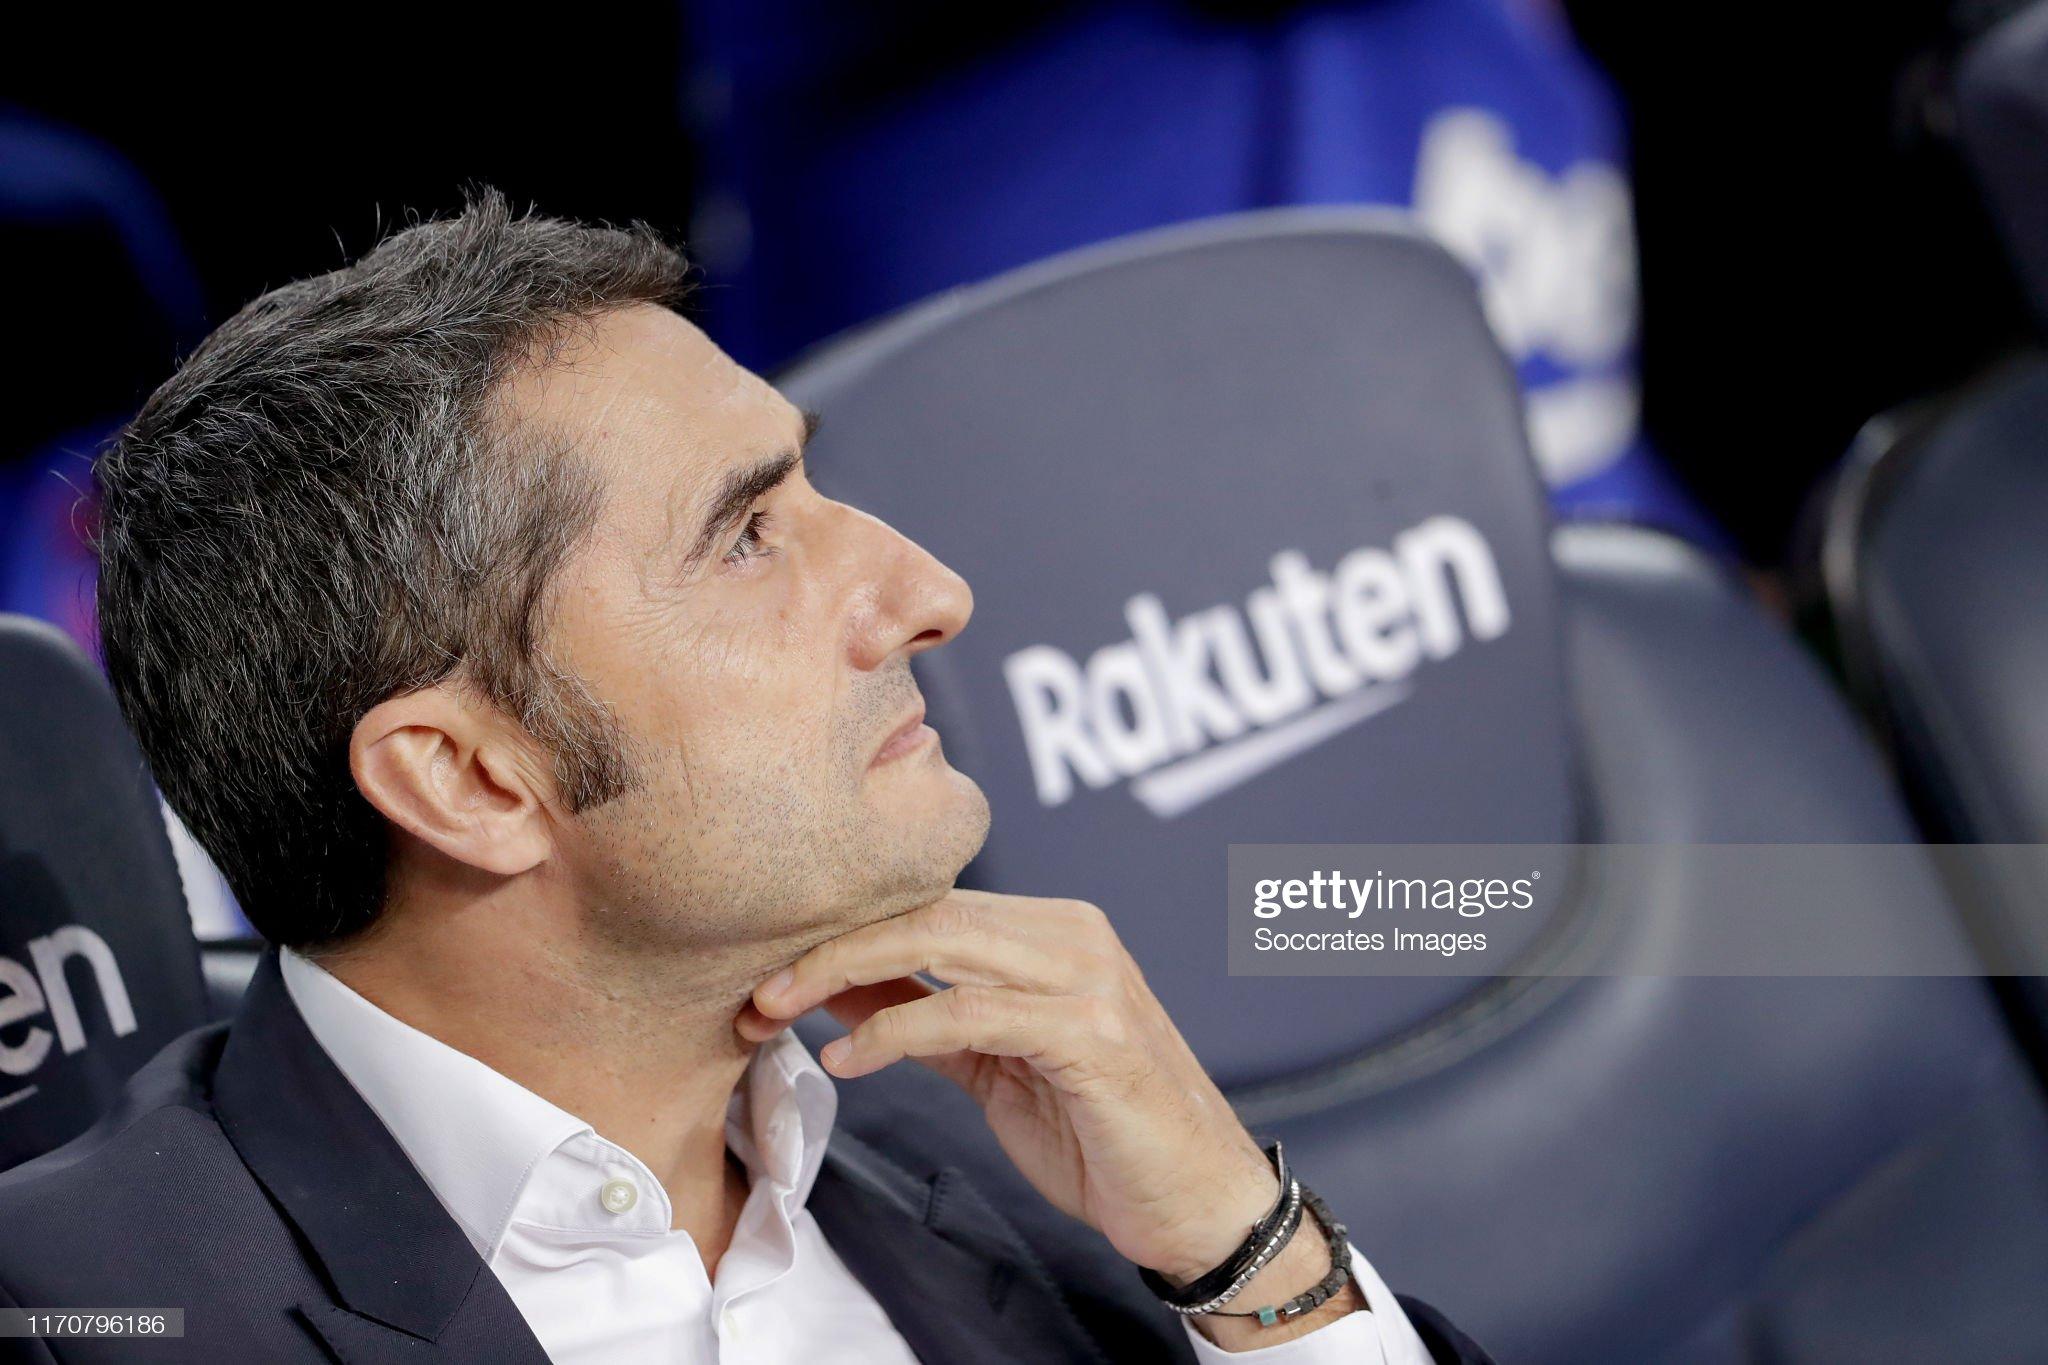 صور مباراة : برشلونة - فياريال 2-1 ( 24-09-2019 )  Coach-ernesto-valverde-of-fc-barcelona-during-the-la-liga-santander-picture-id1170796186?s=2048x2048